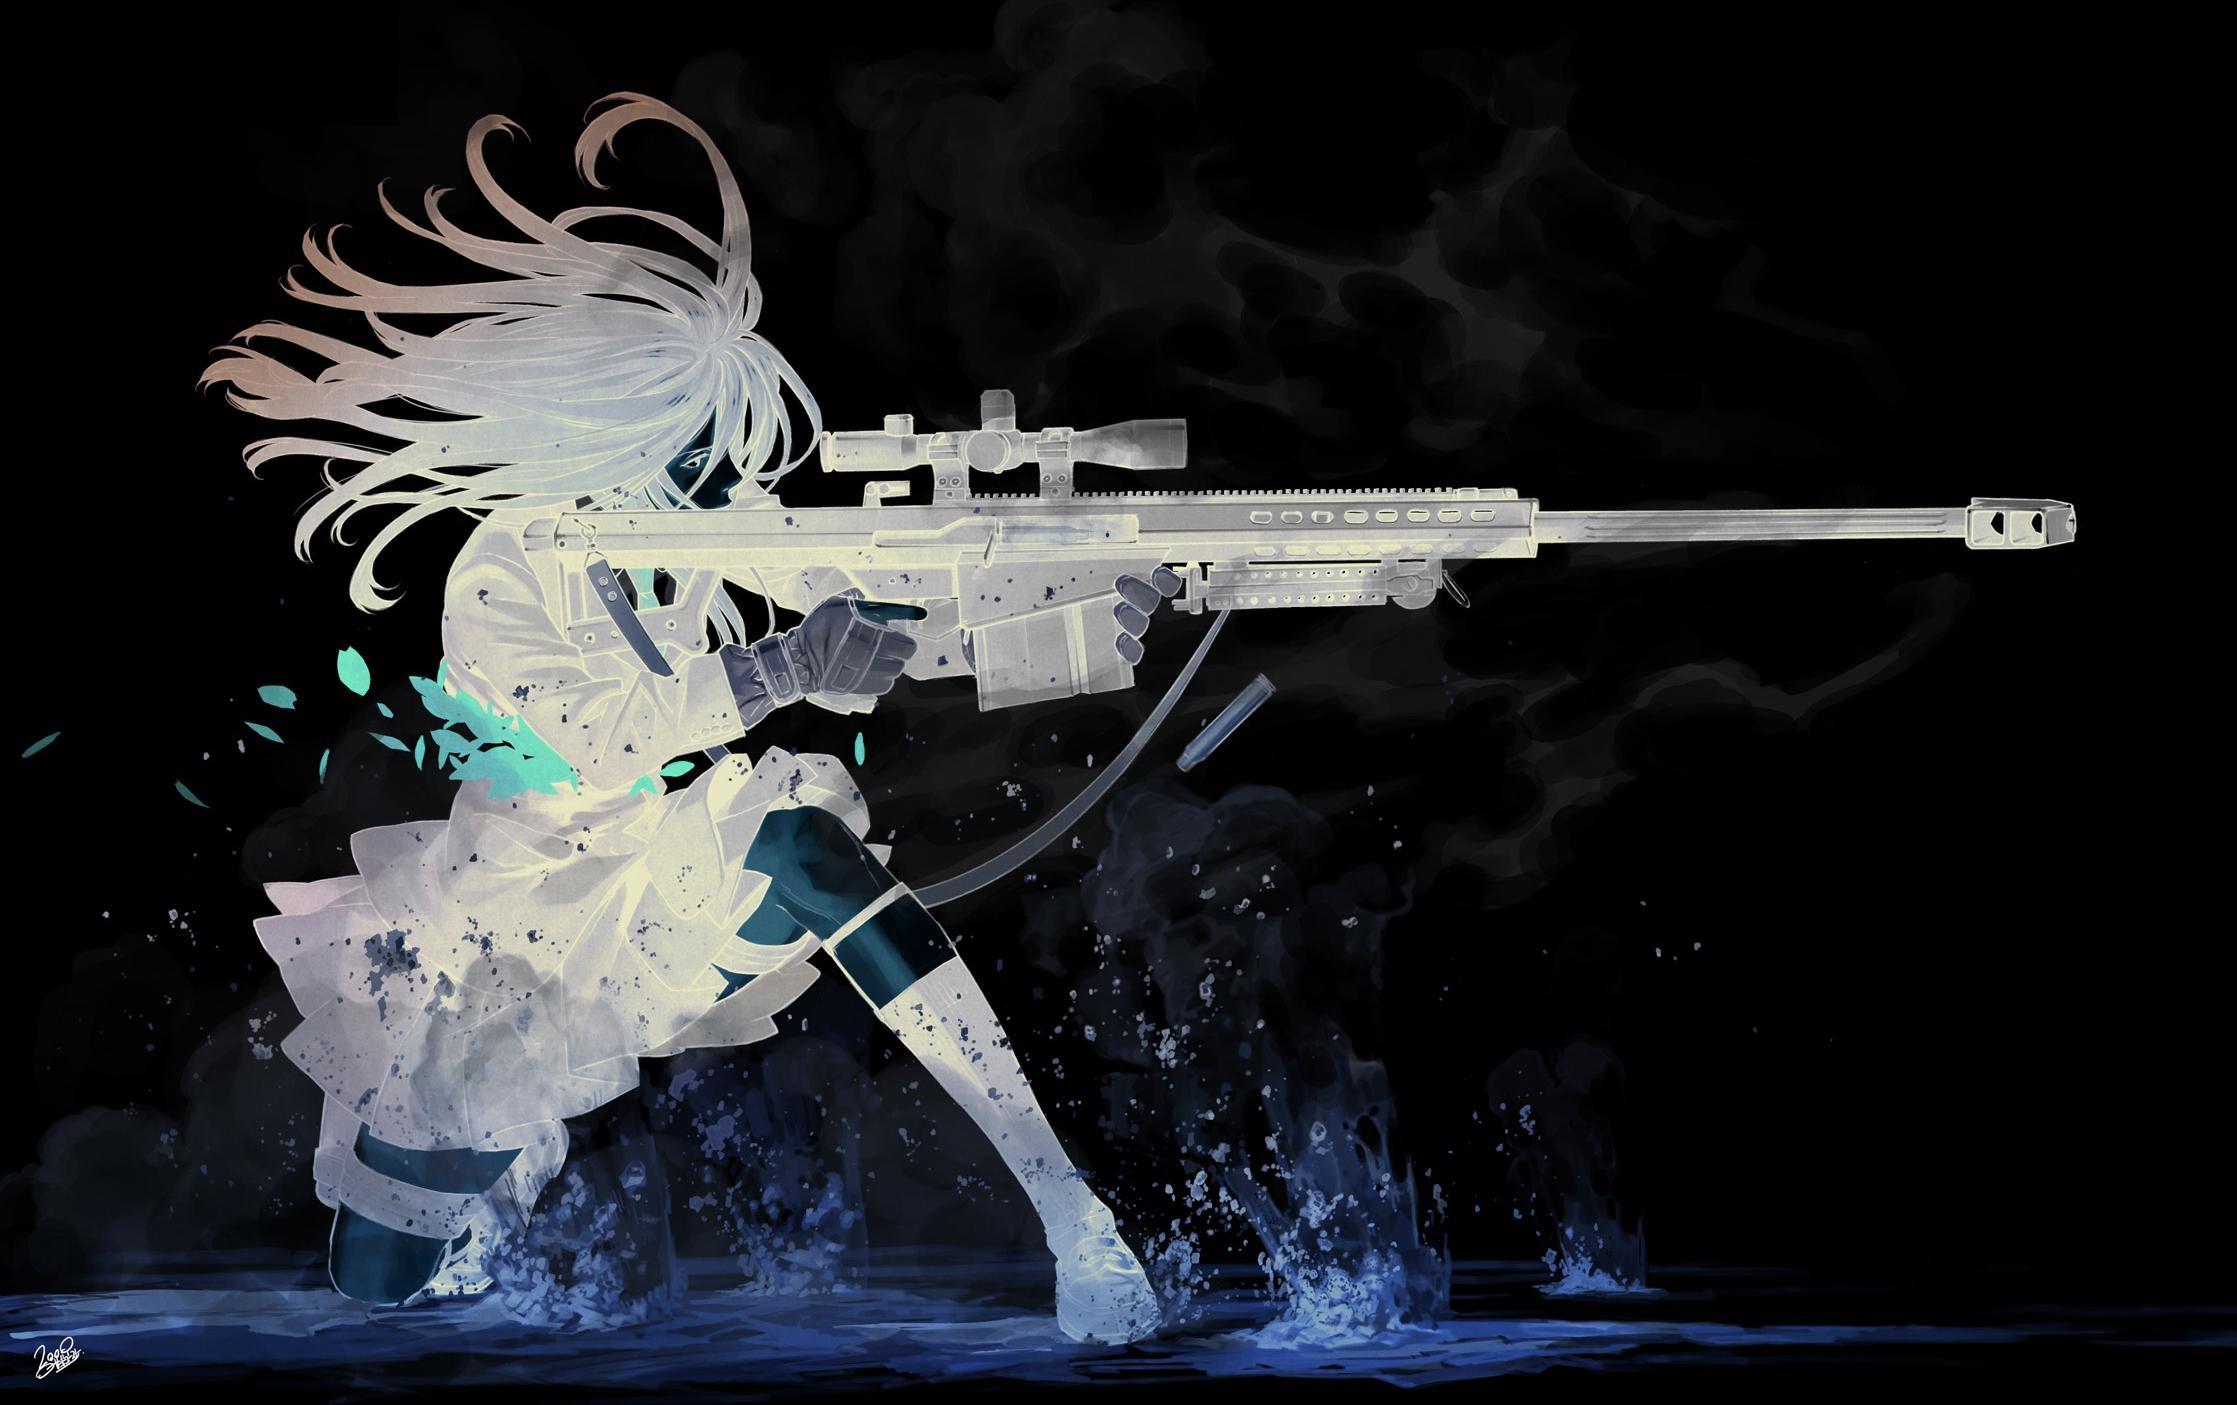 Sniper Category General This Free Desktop Wallpaper Has Been Viewed